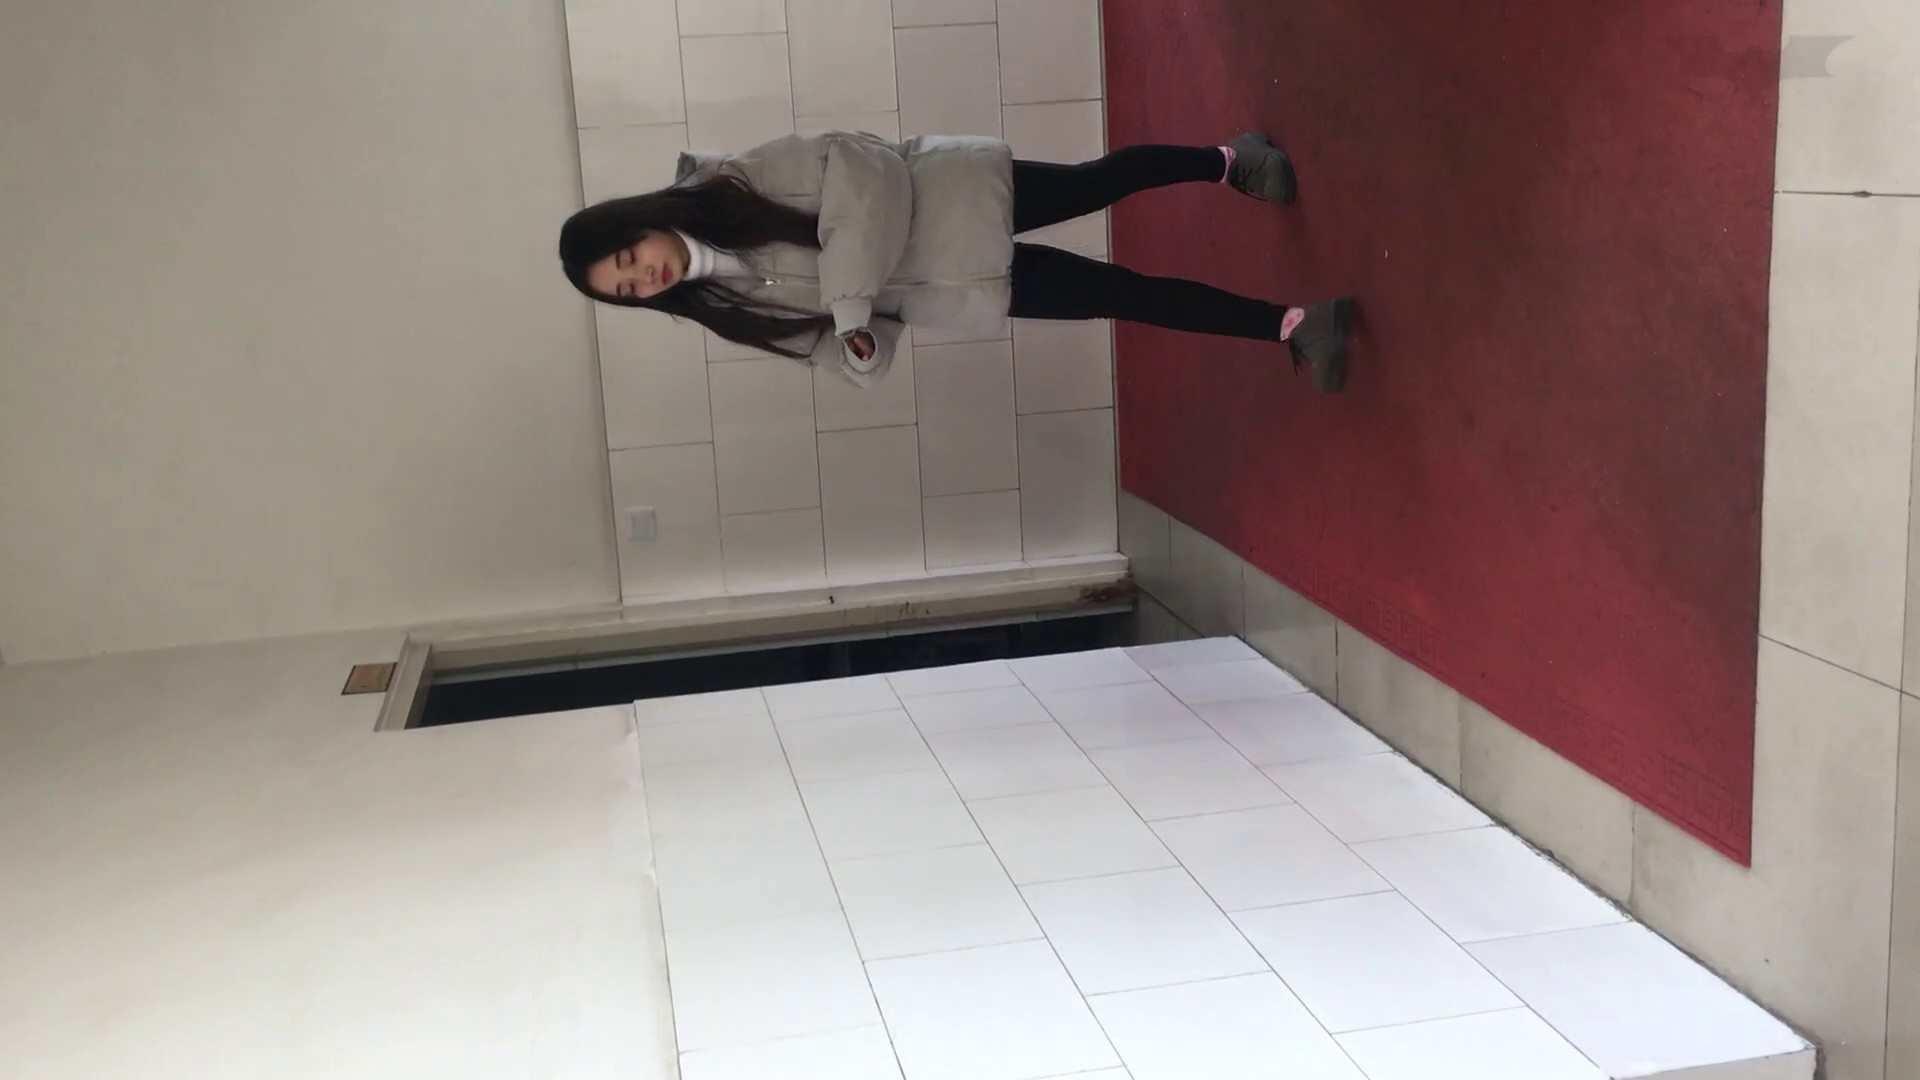 芸術大学ガチ潜入盗撮 JD盗撮 美女の洗面所の秘密 Vol.80 盛合せ  79PIX 20